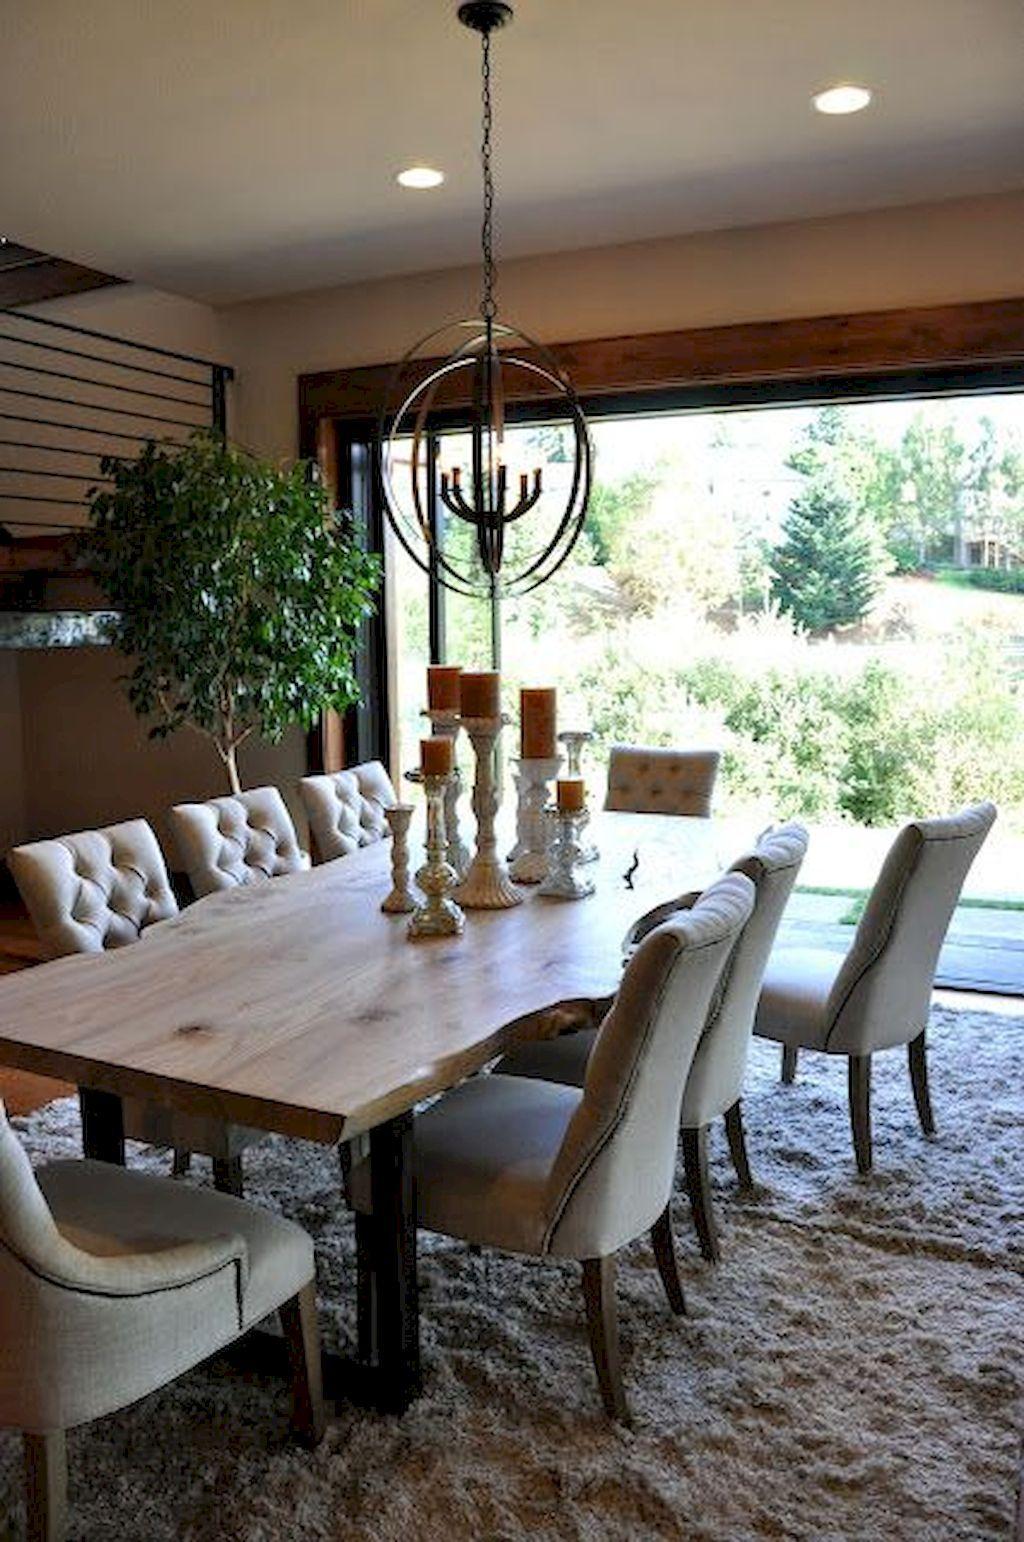 85 Rustic Farmhouse Dining Room Table Decor Ideas Structhome Com Unique Dining Tables Rustic Dining Room Dining Room Table Decor